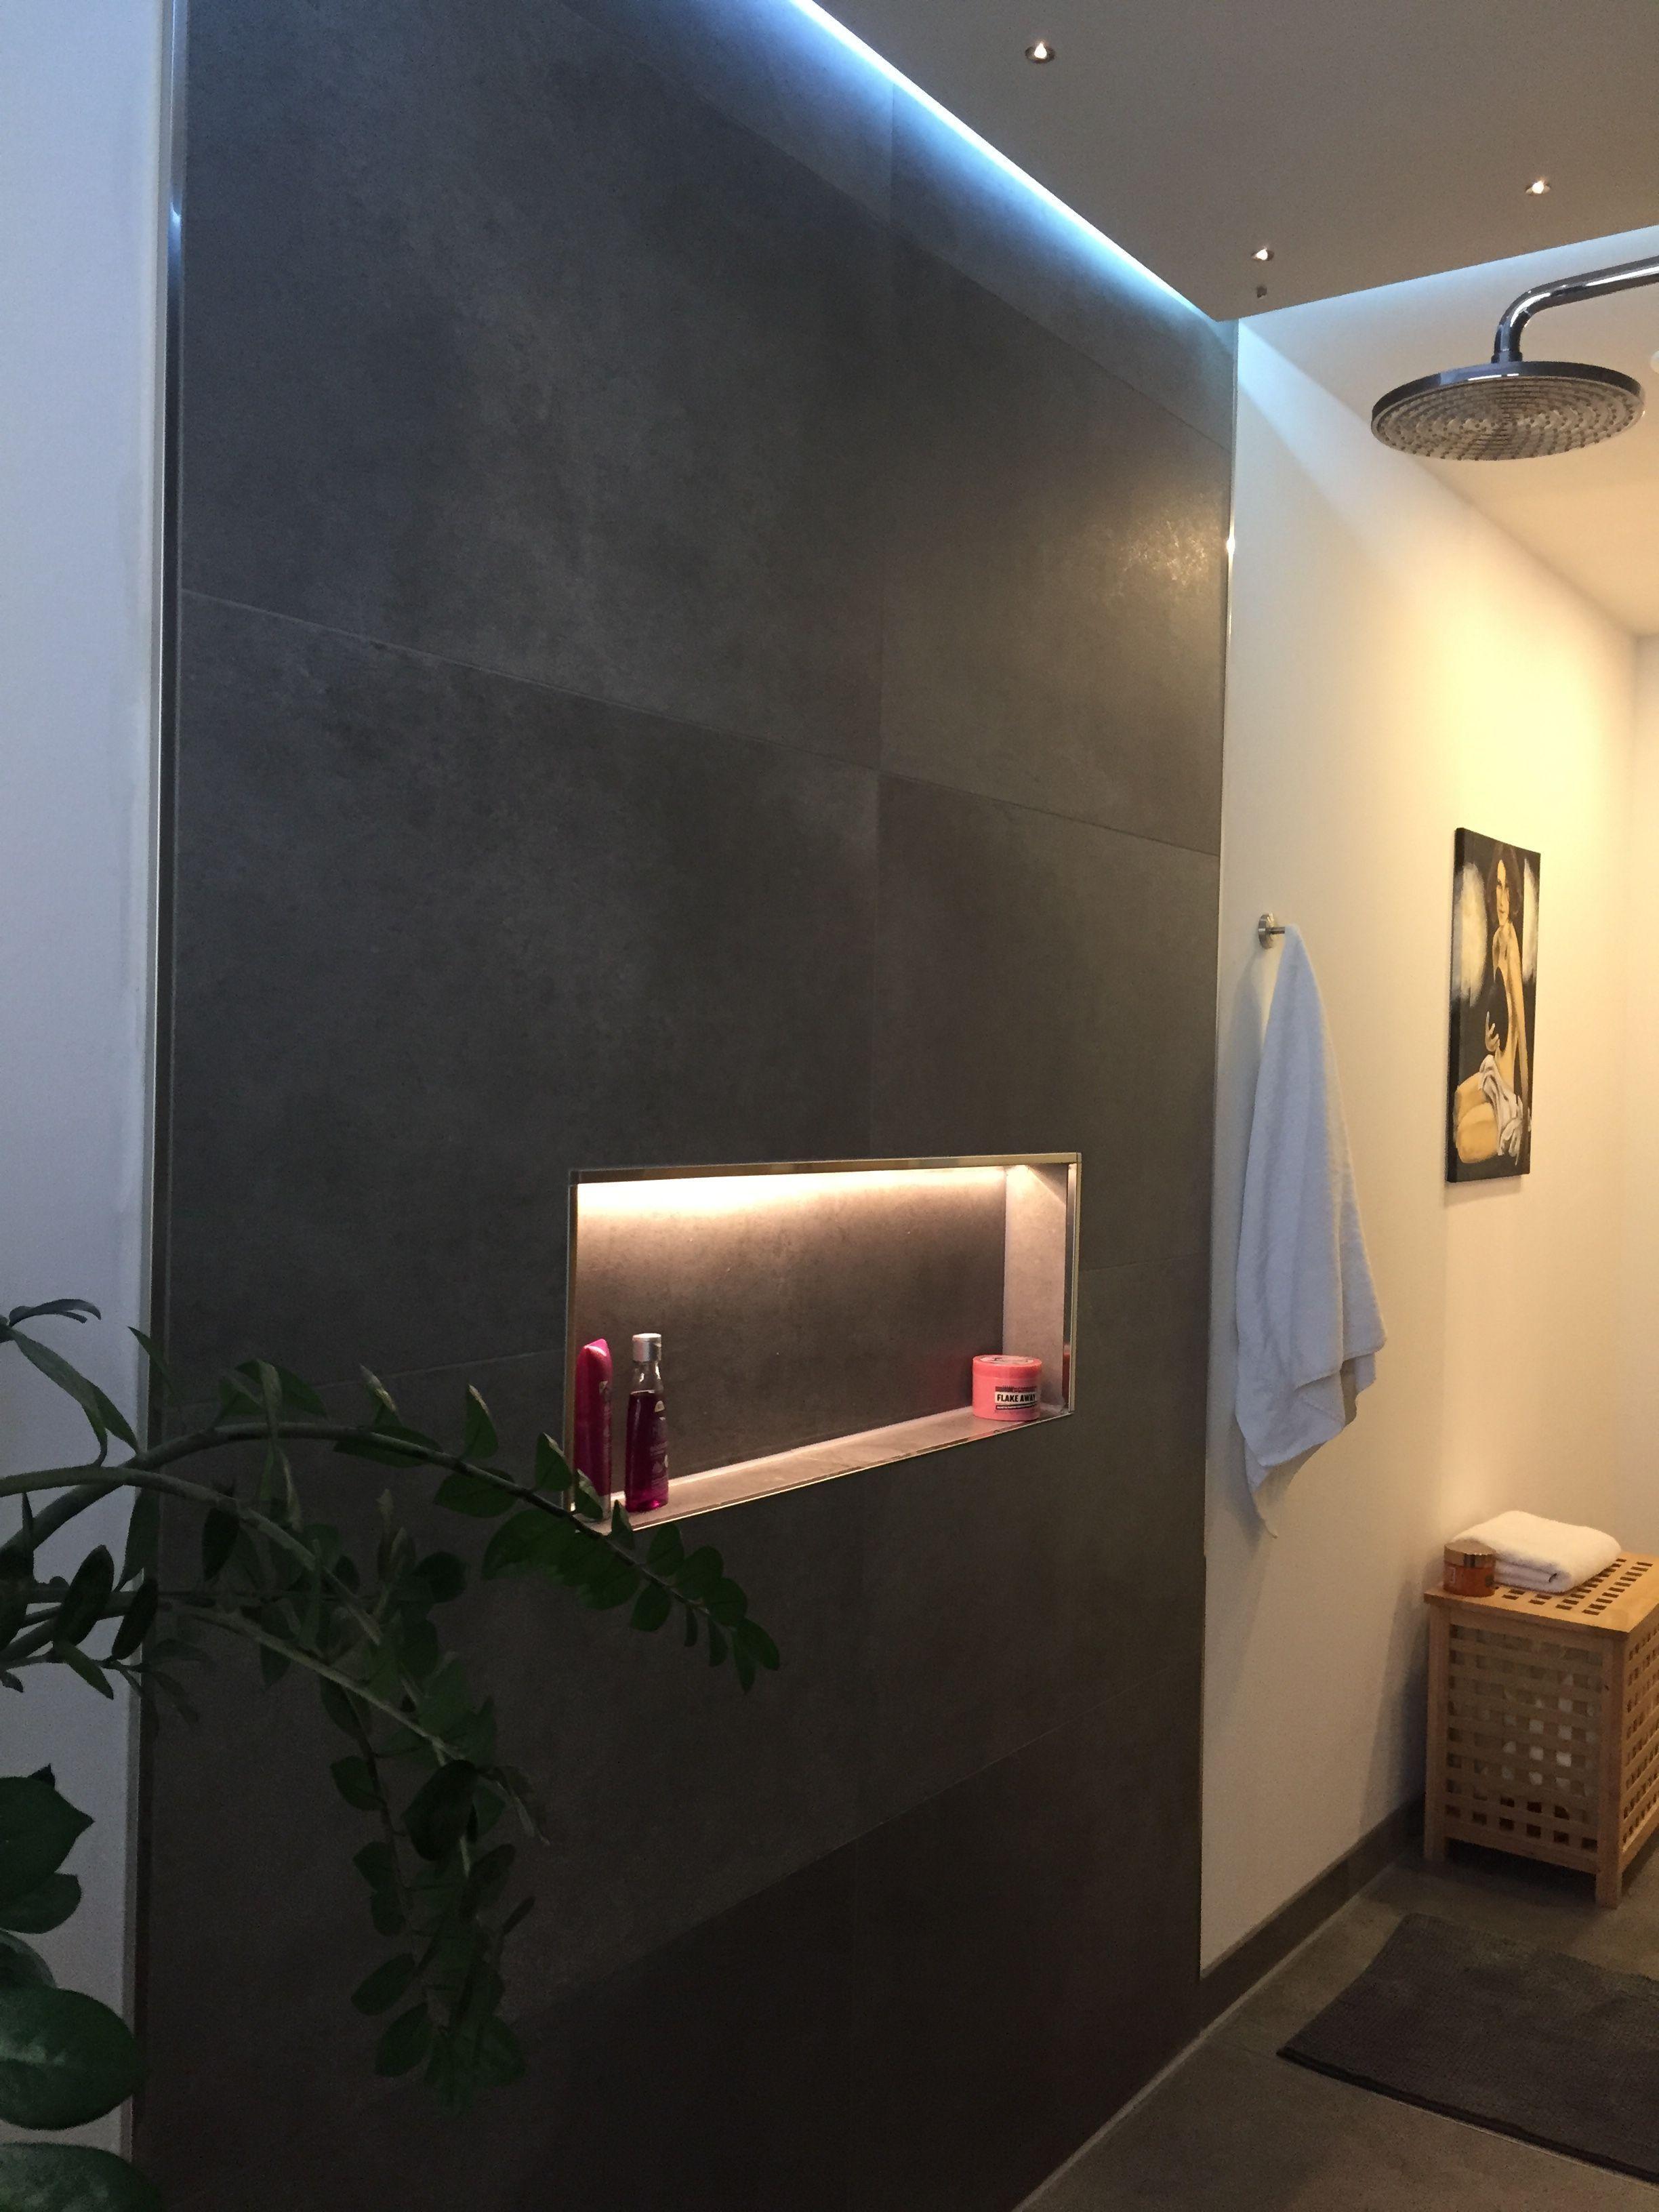 5 Bathroom Shower Light Indirect Indirekte Beleuchtung Abkastung